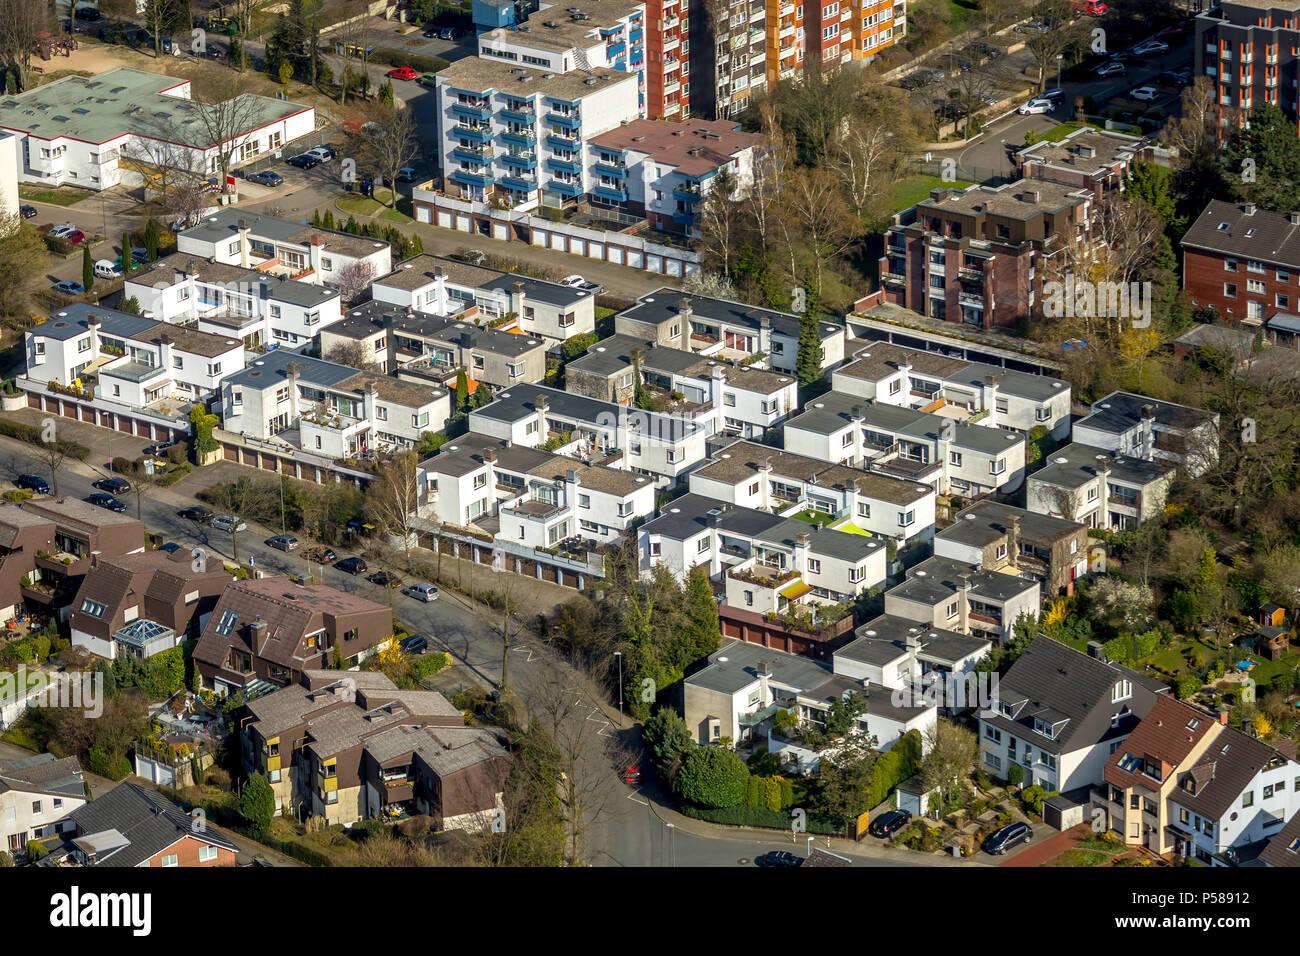 Bungalow settlement Bochum-Querenburg with roof terraces in Bochum in NRW. Bochum, Ruhr area, North Rhine-Westphalia, Germany, Bochum, DEU, Europe, ae - Stock Image